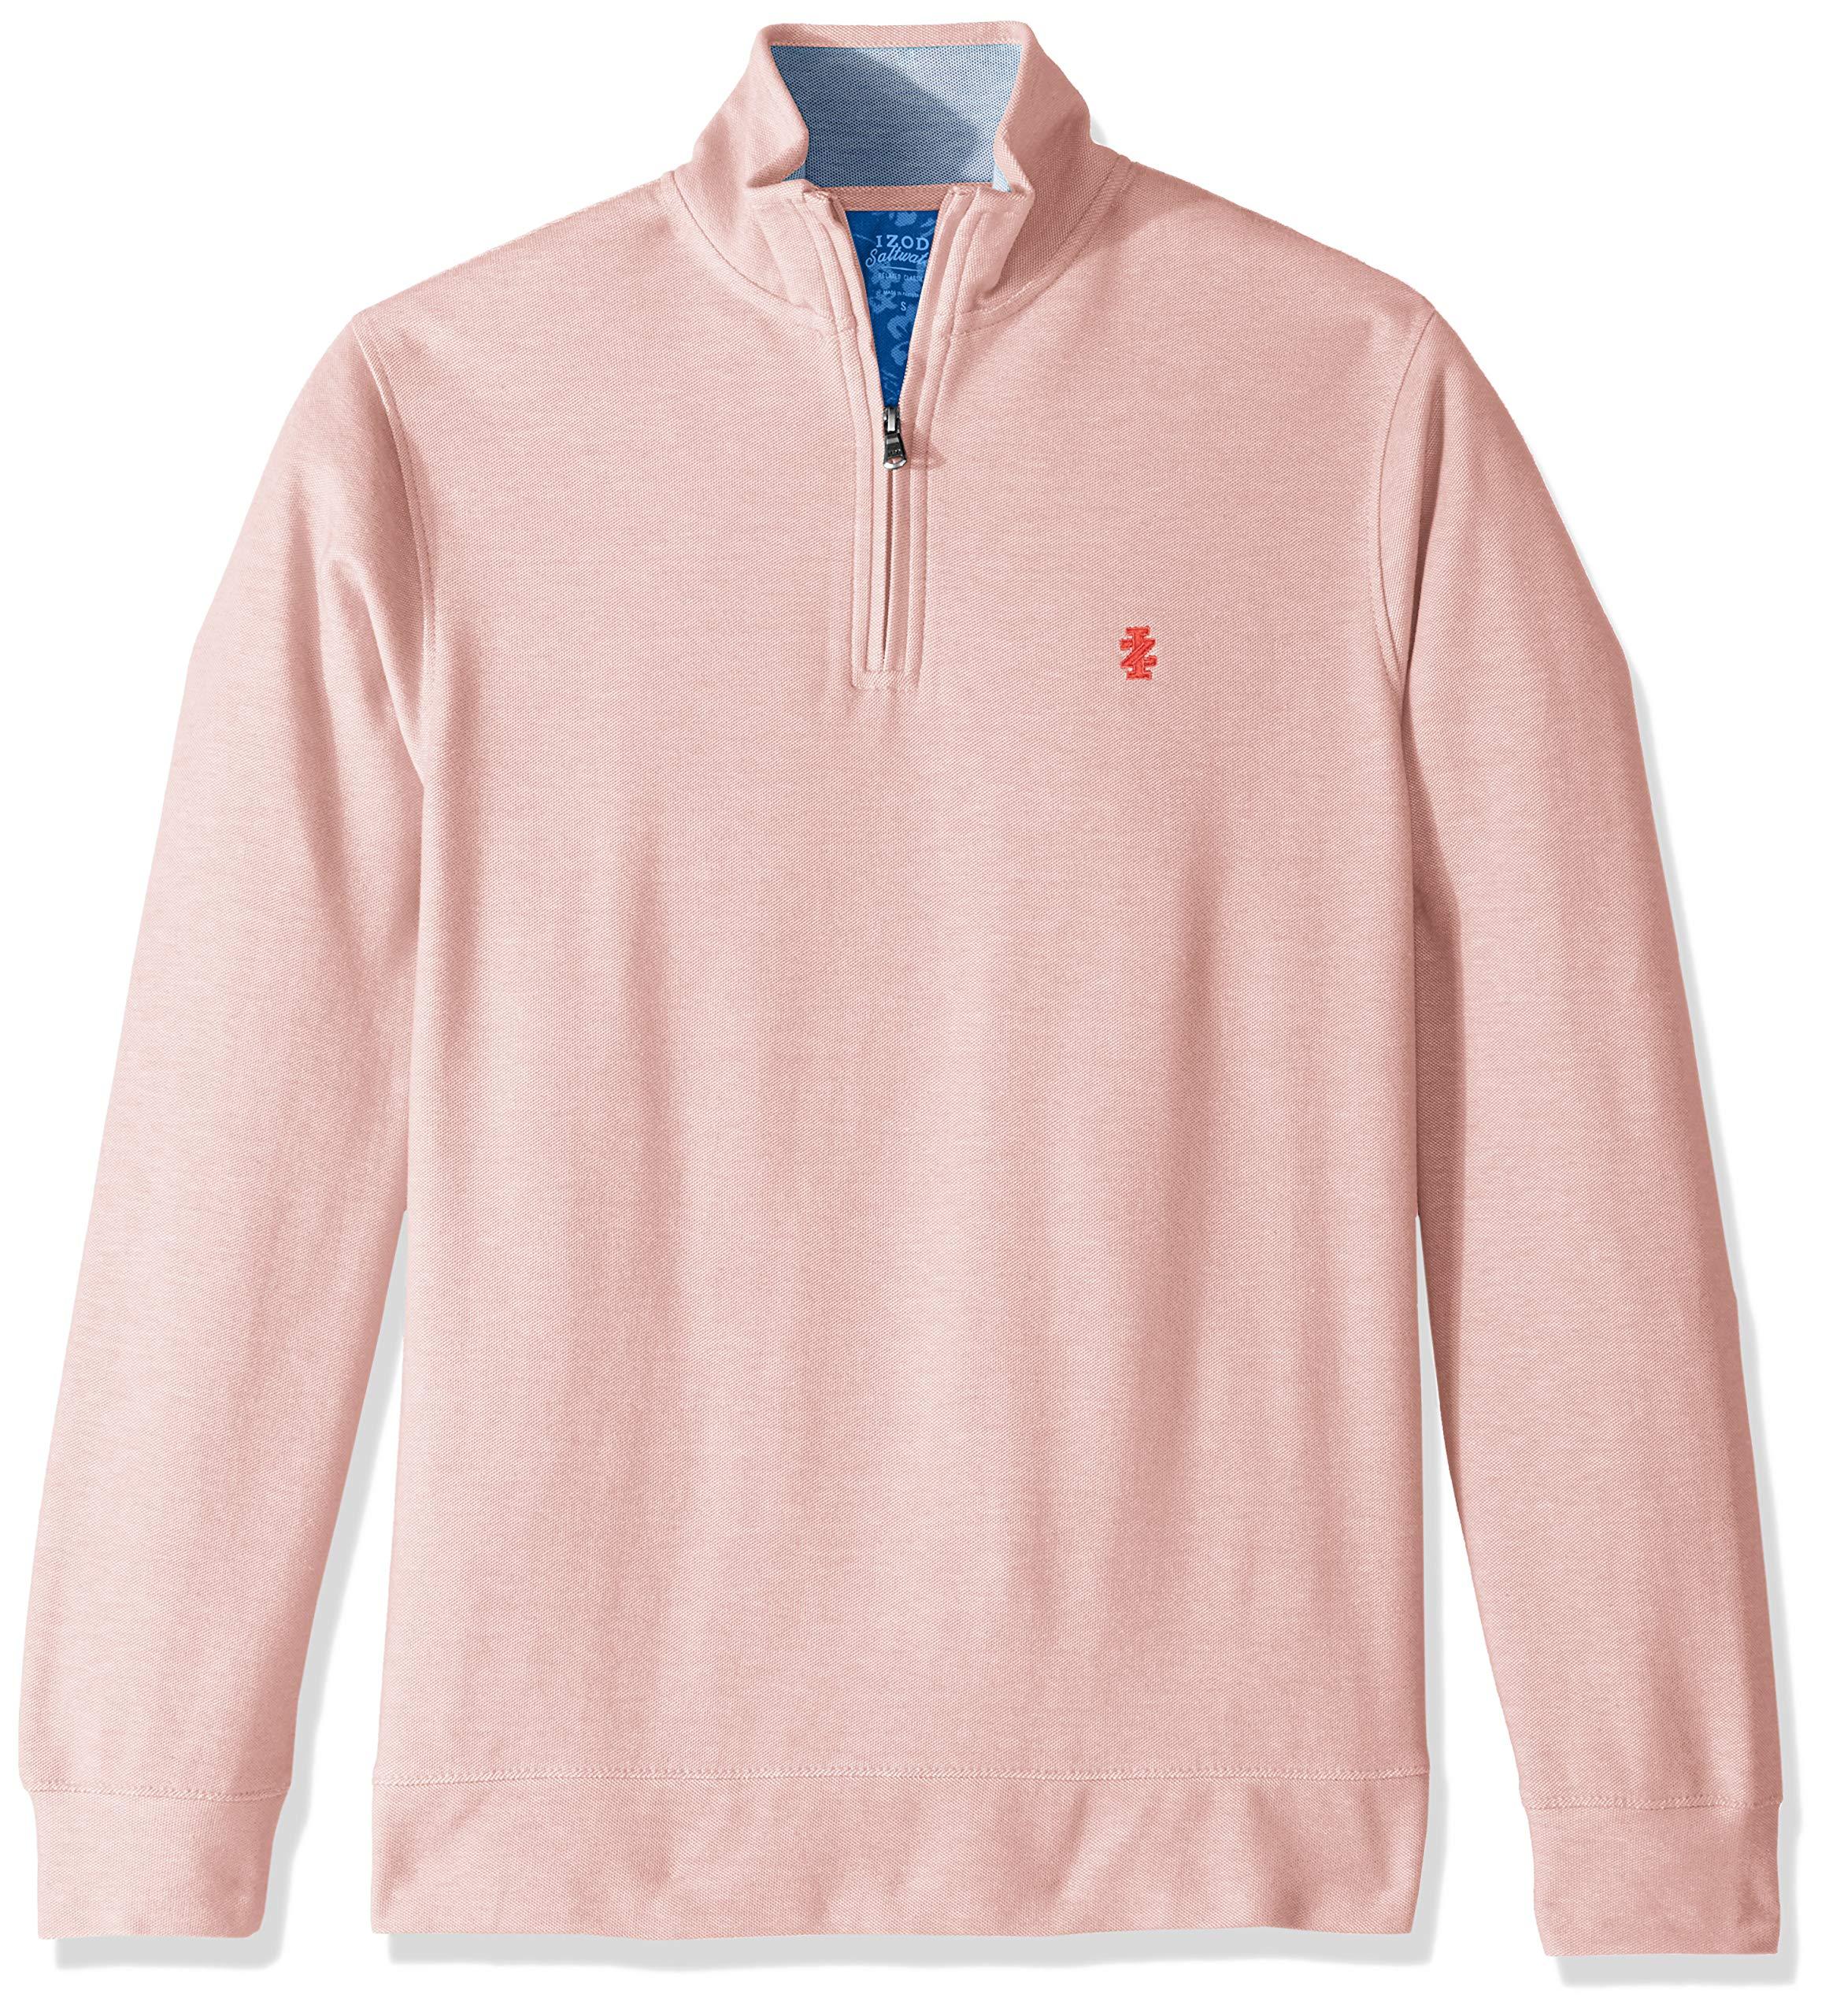 IZOD Men's Saltwater Quarter Zip Pullover, red, X-Large